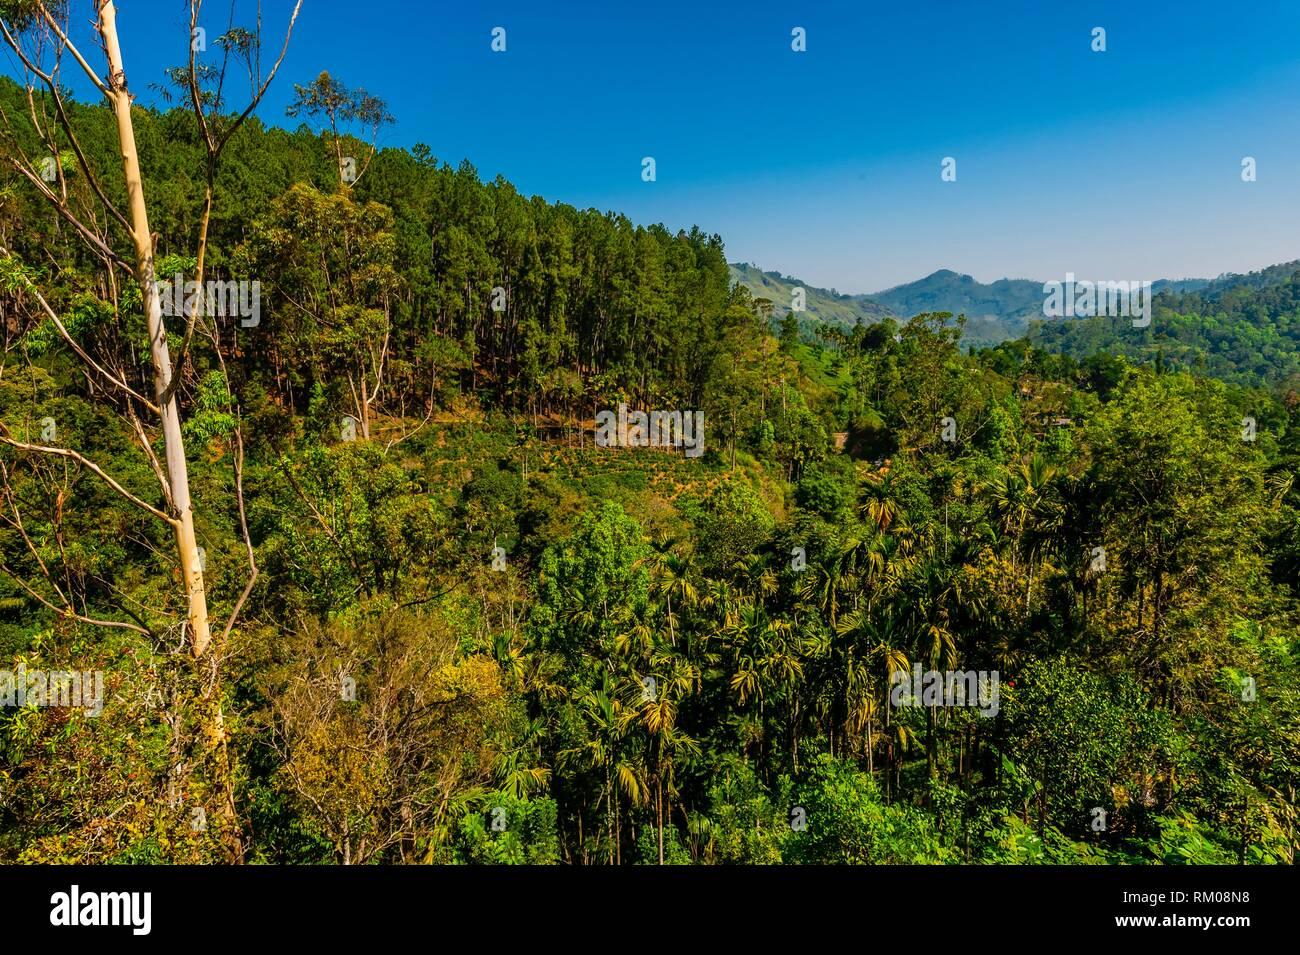 Ambagollapathana, Uva Province, Sri Lanka. - Stock Image